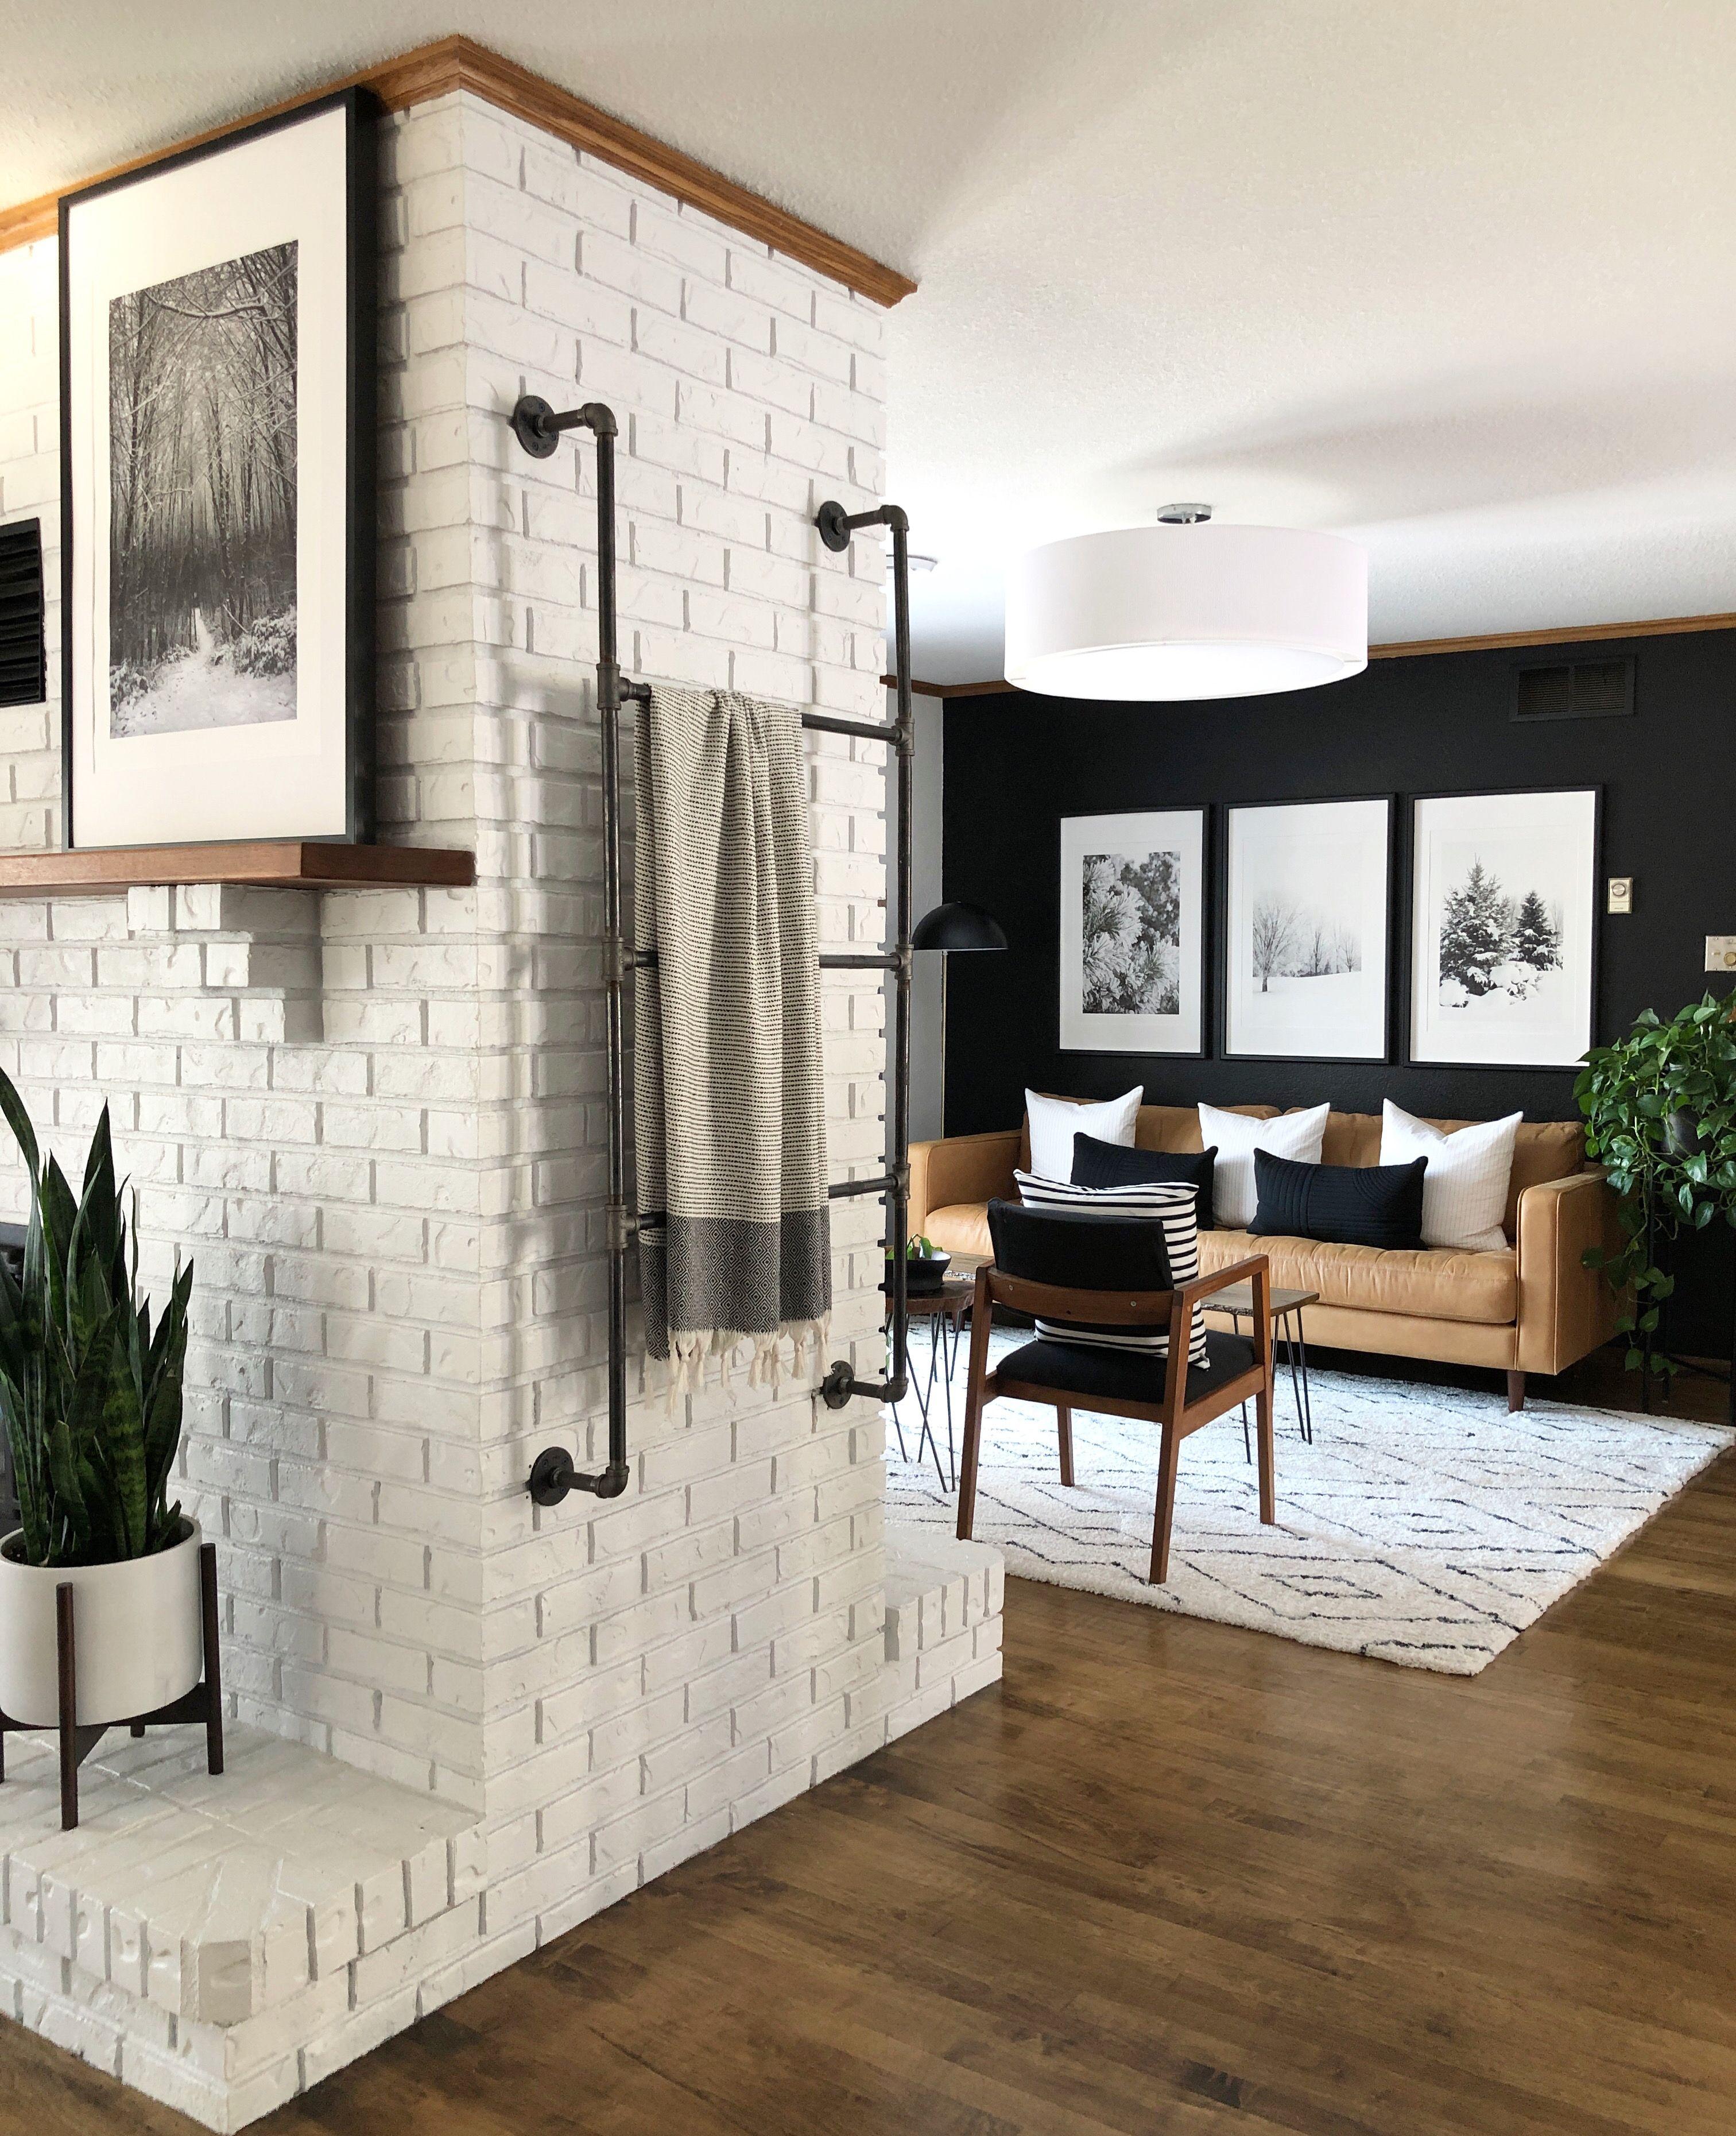 kate chipinski designs in 2020 mid century modern living on beautiful modern black white living room inspired id=47181